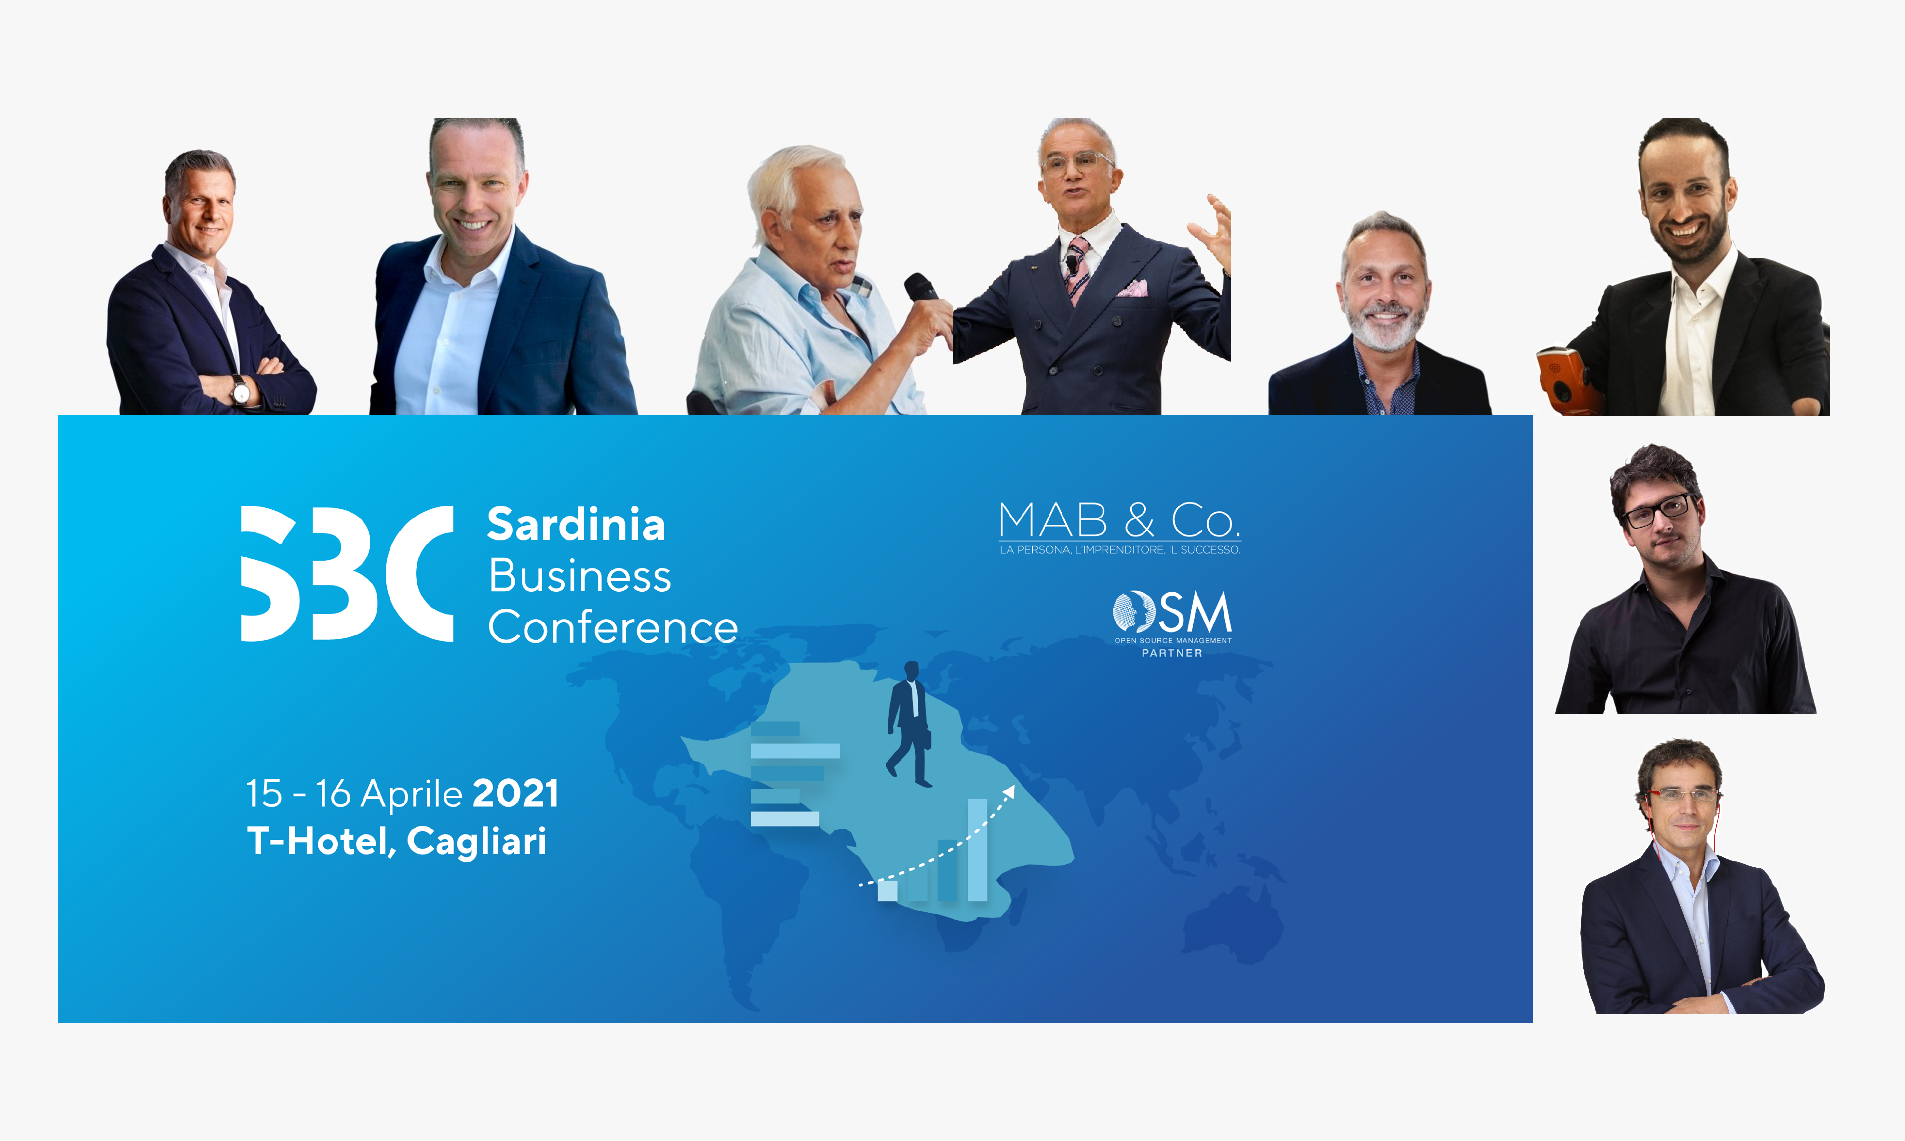 sardinia-business-conference